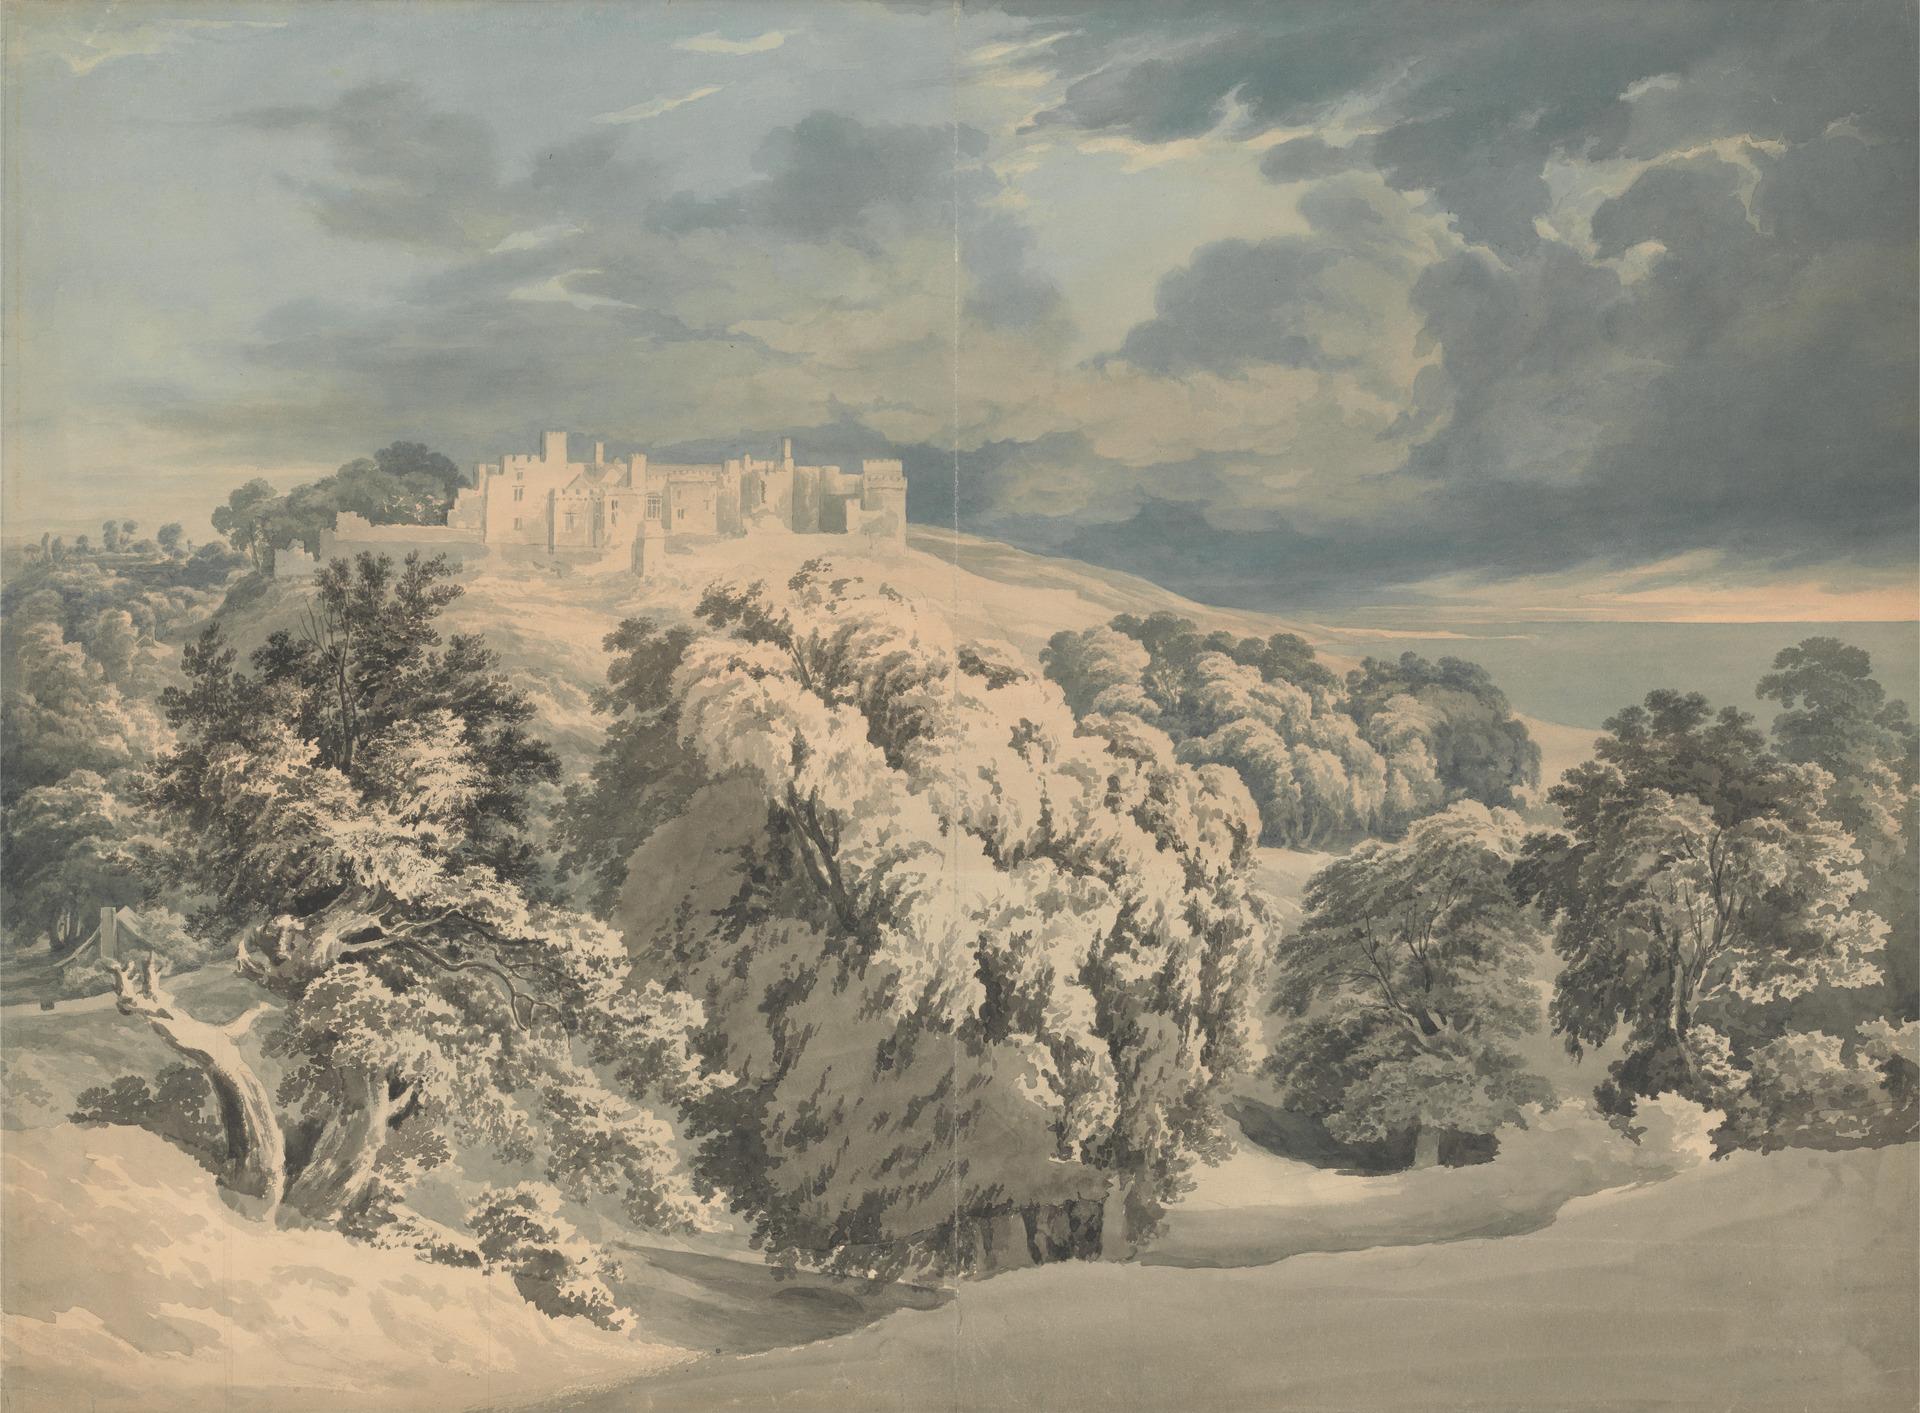 St. Donat's Castle, Glamorganshire. John Glover. Undated.